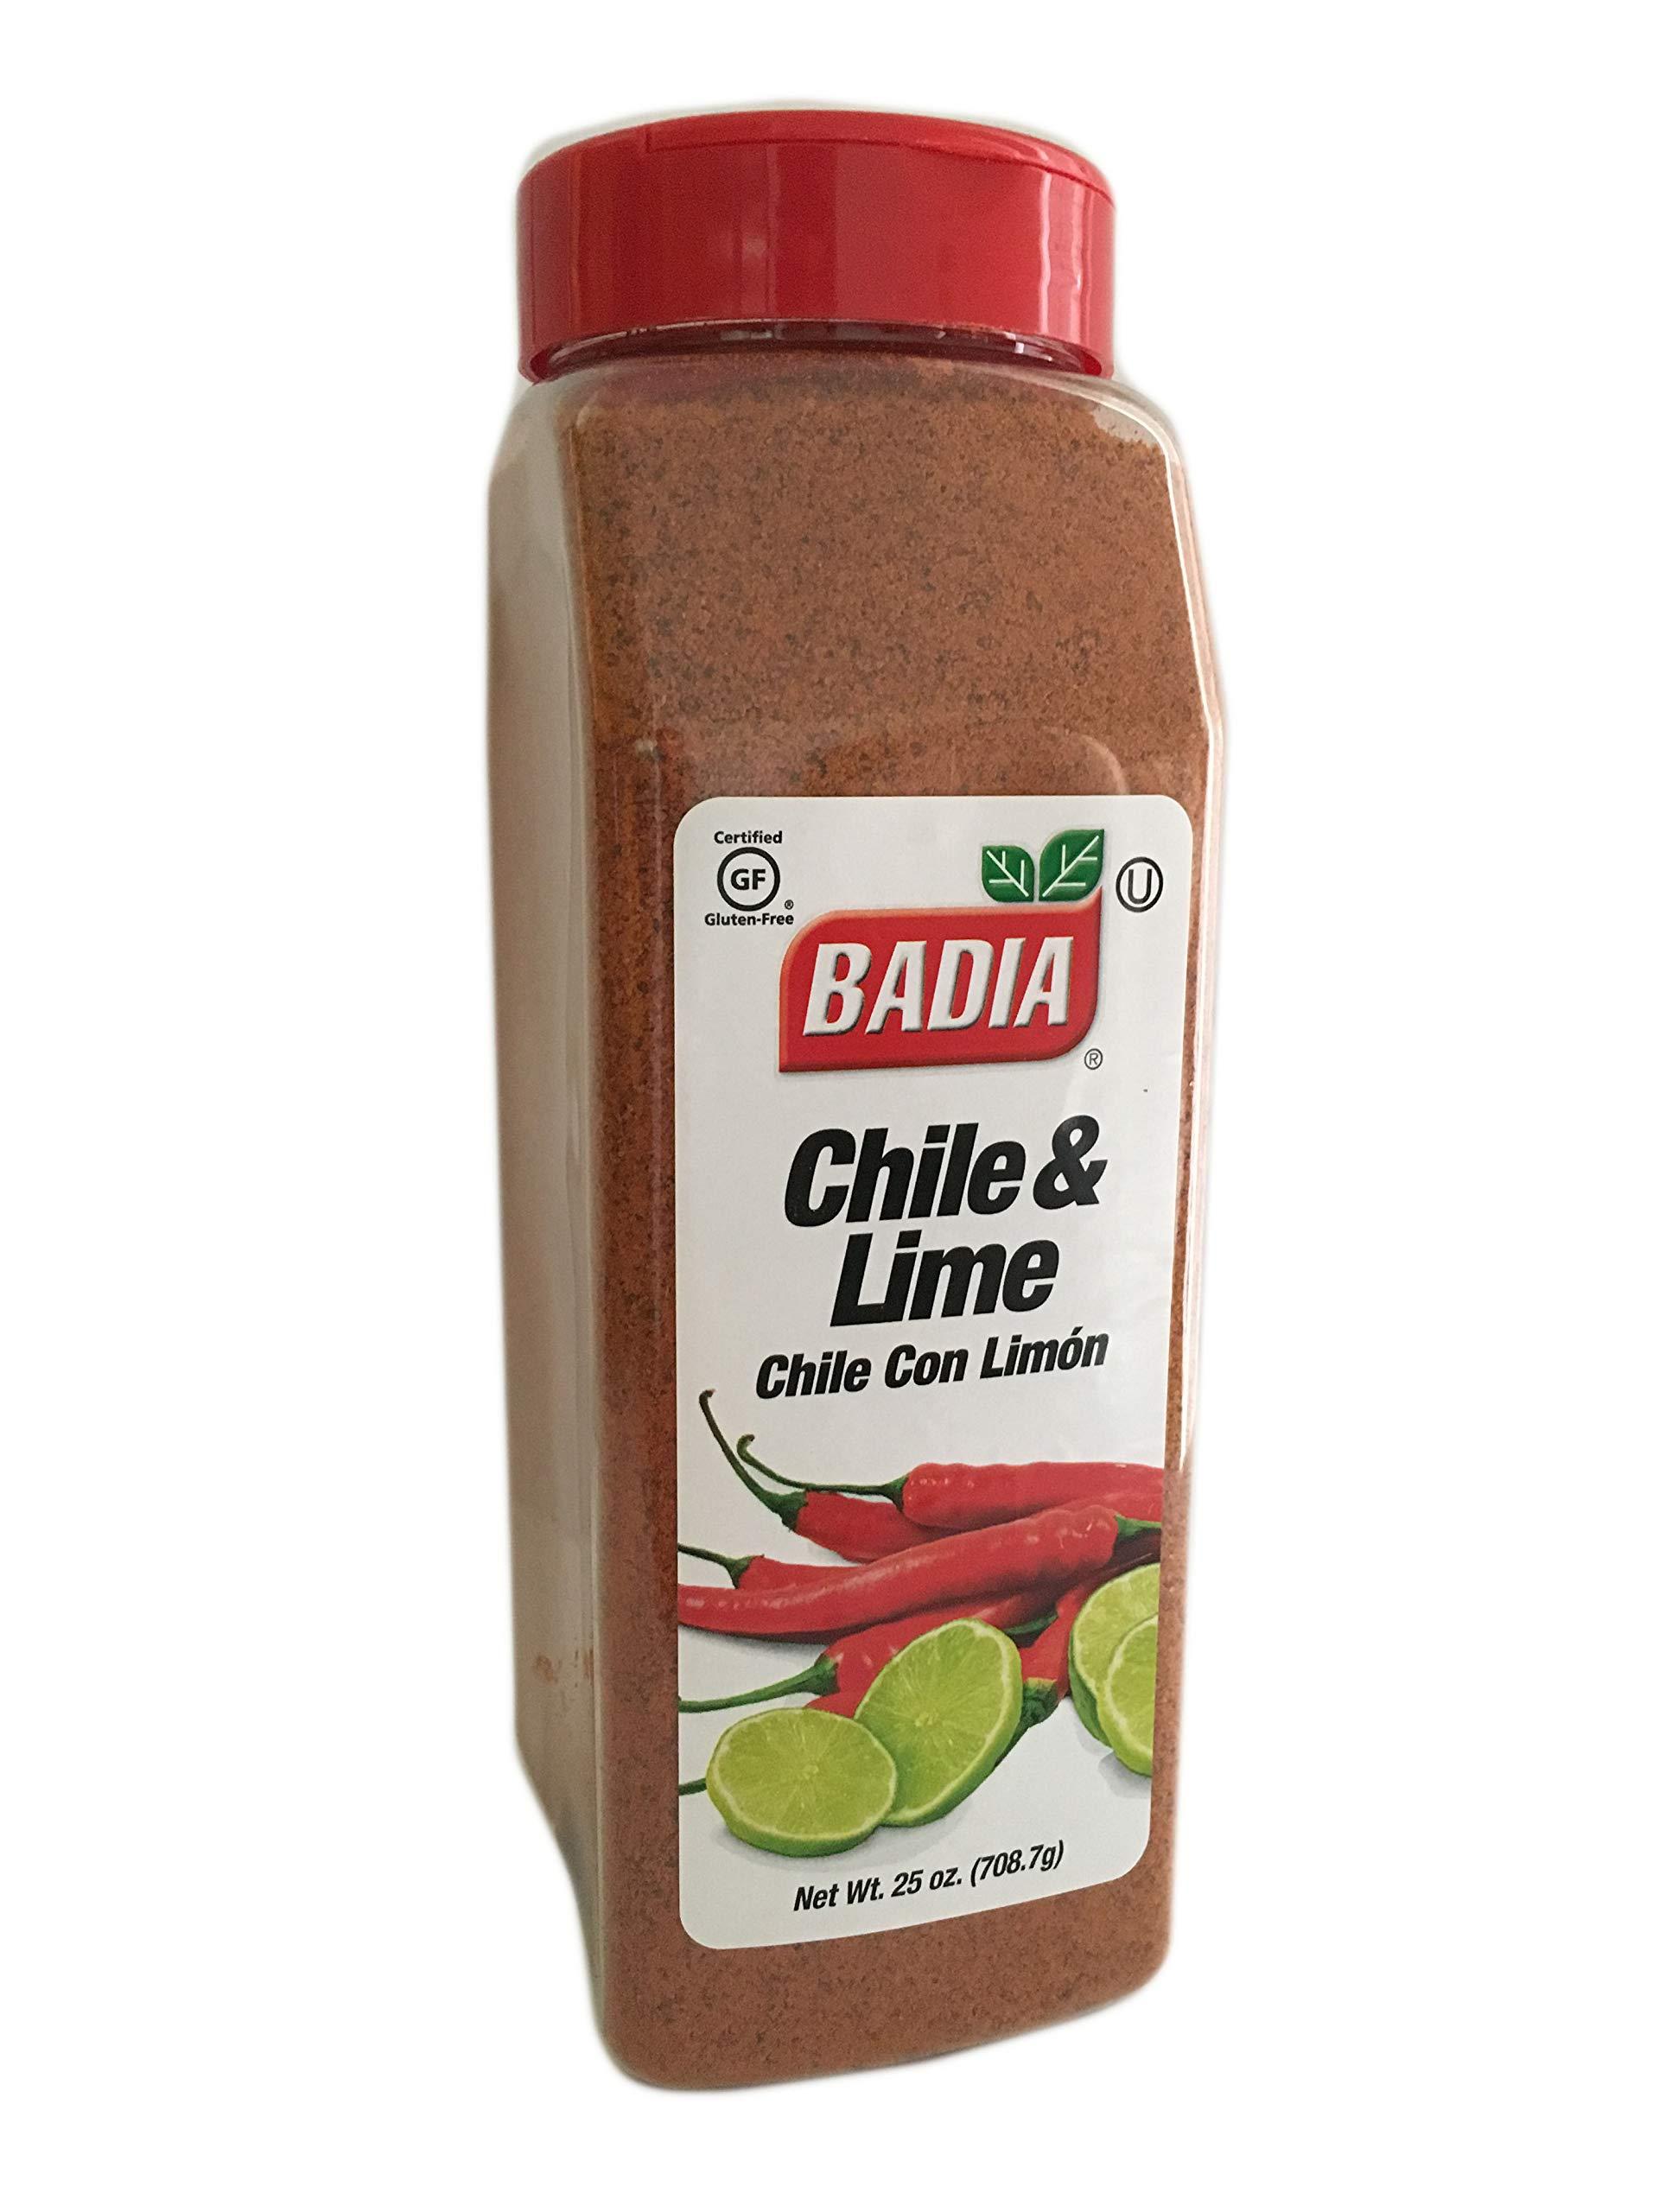 2 PACK Chile Lime Seasoning/Chili con Limon Kosher 2x25 oz